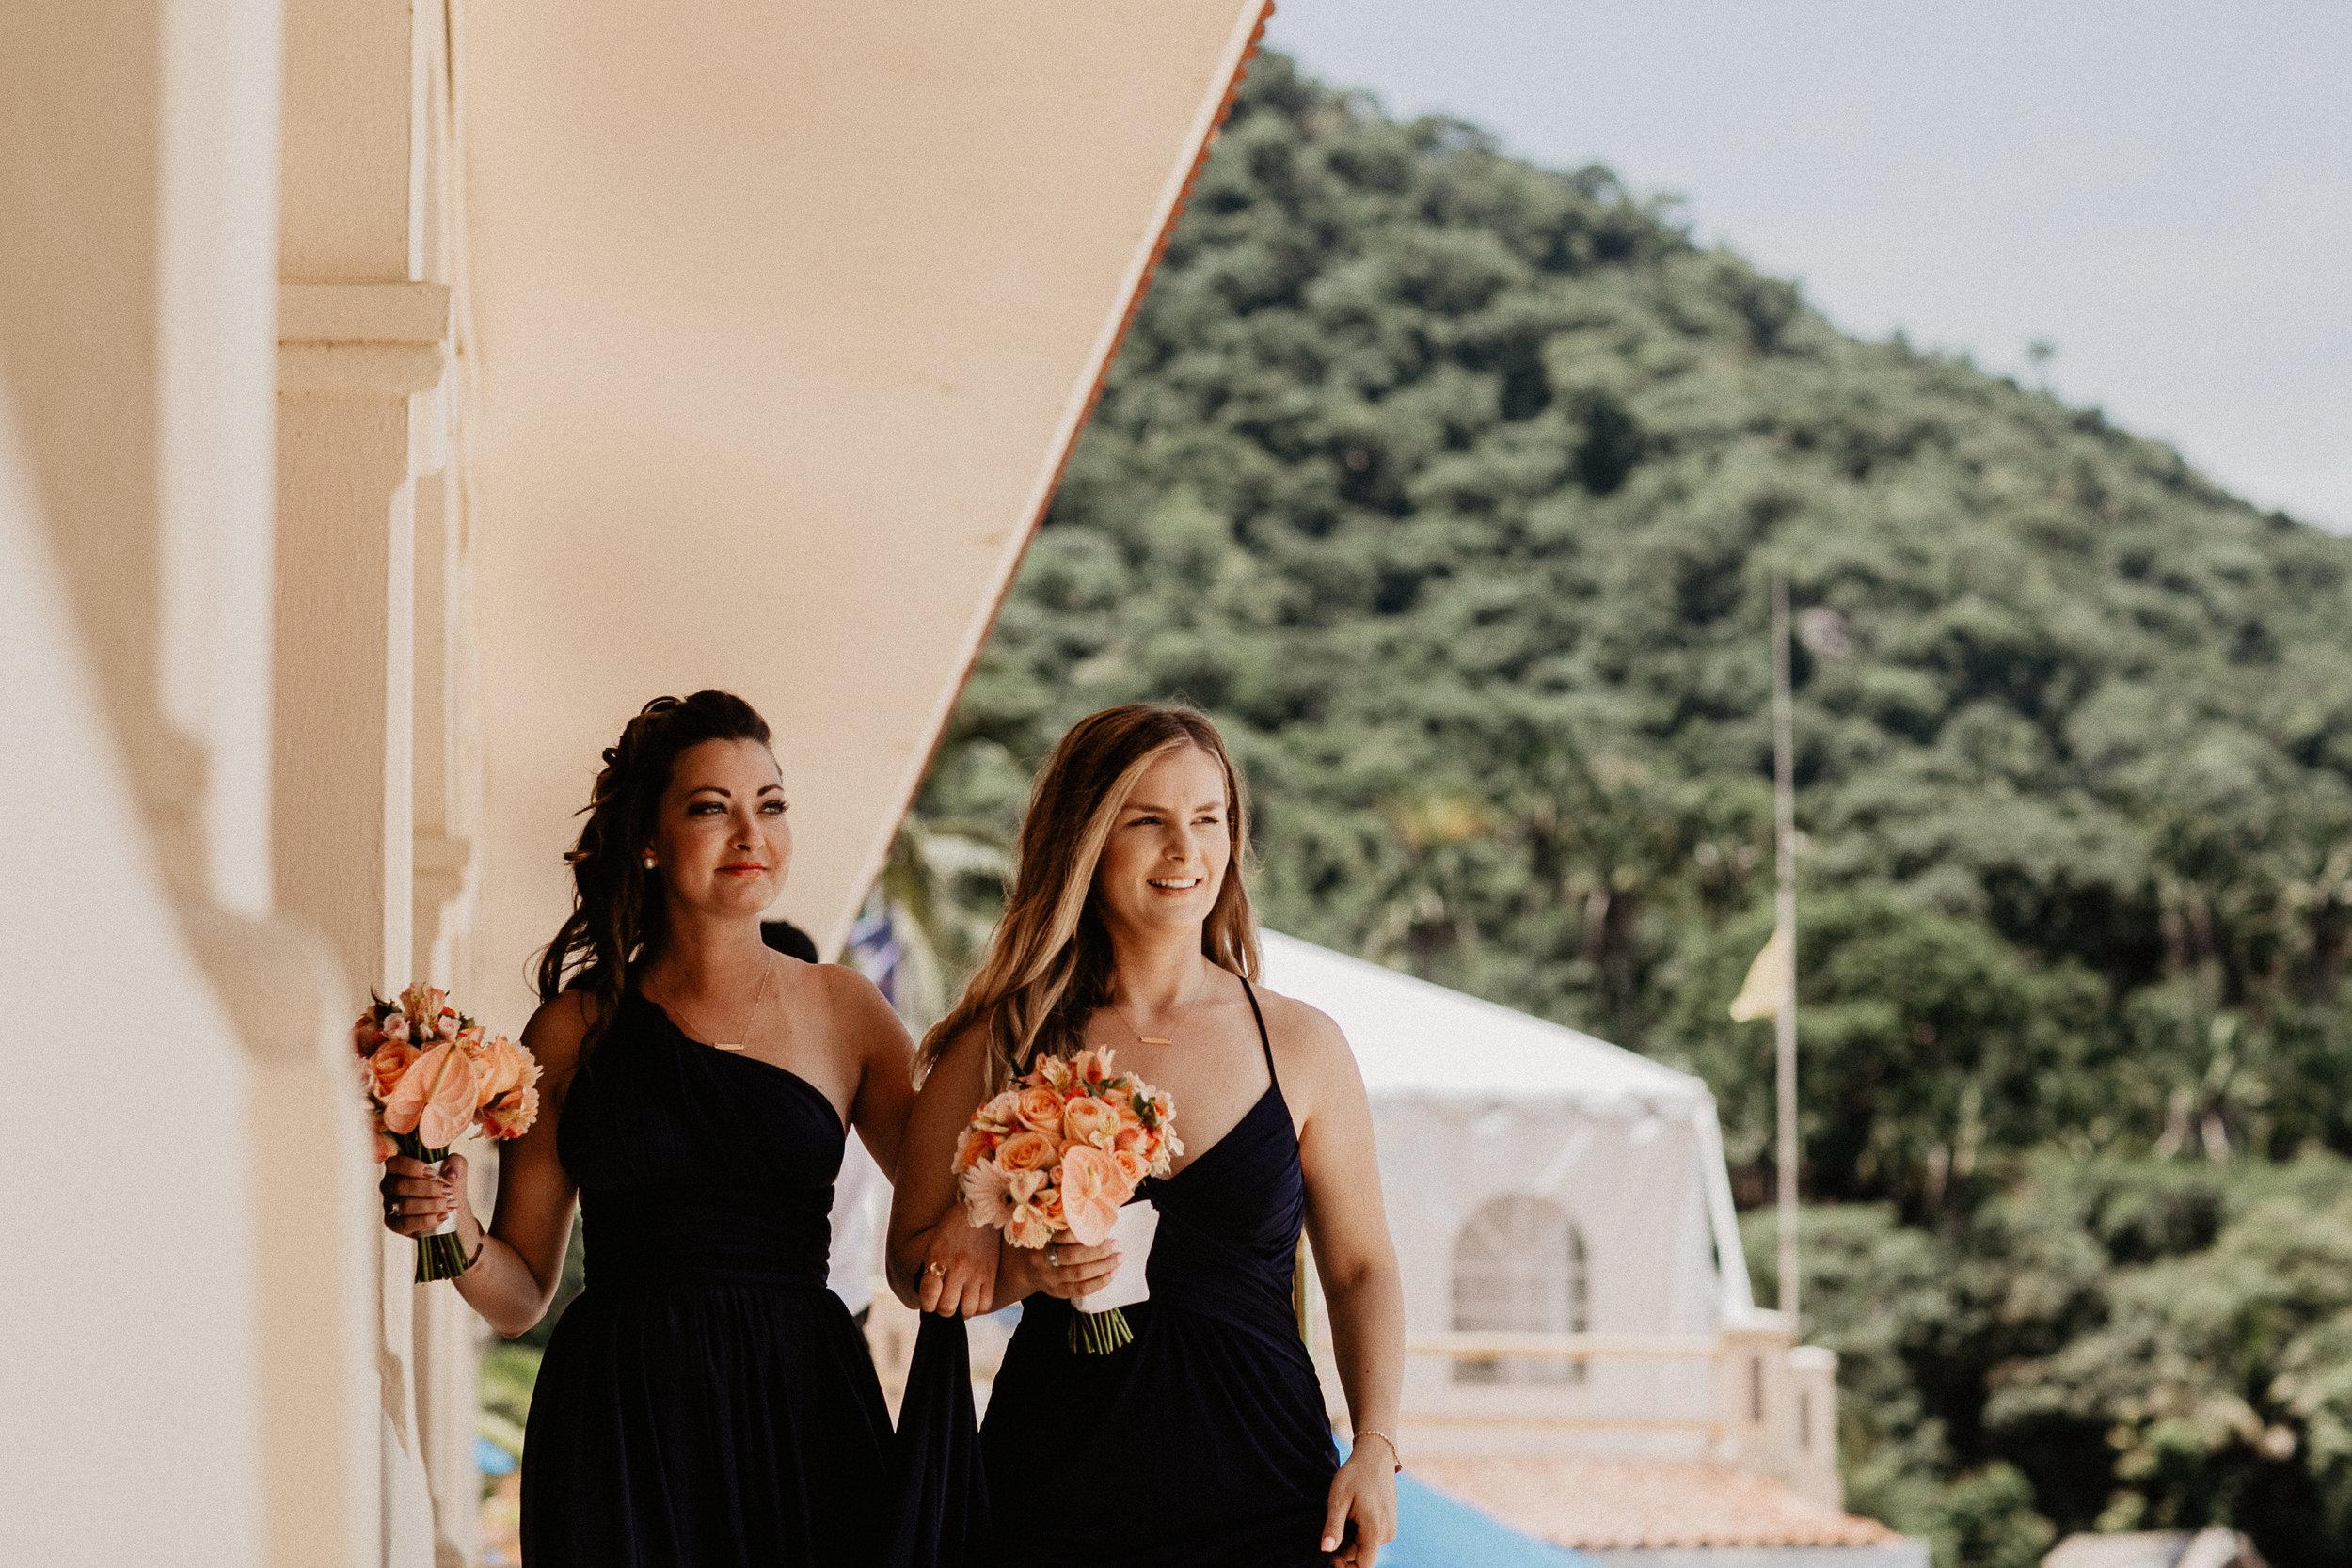 alfonso_flores_destination_wedding_photography_puerto_vallarta_hotel_barcelo_vallarta_cuttler_amela-203.JPG